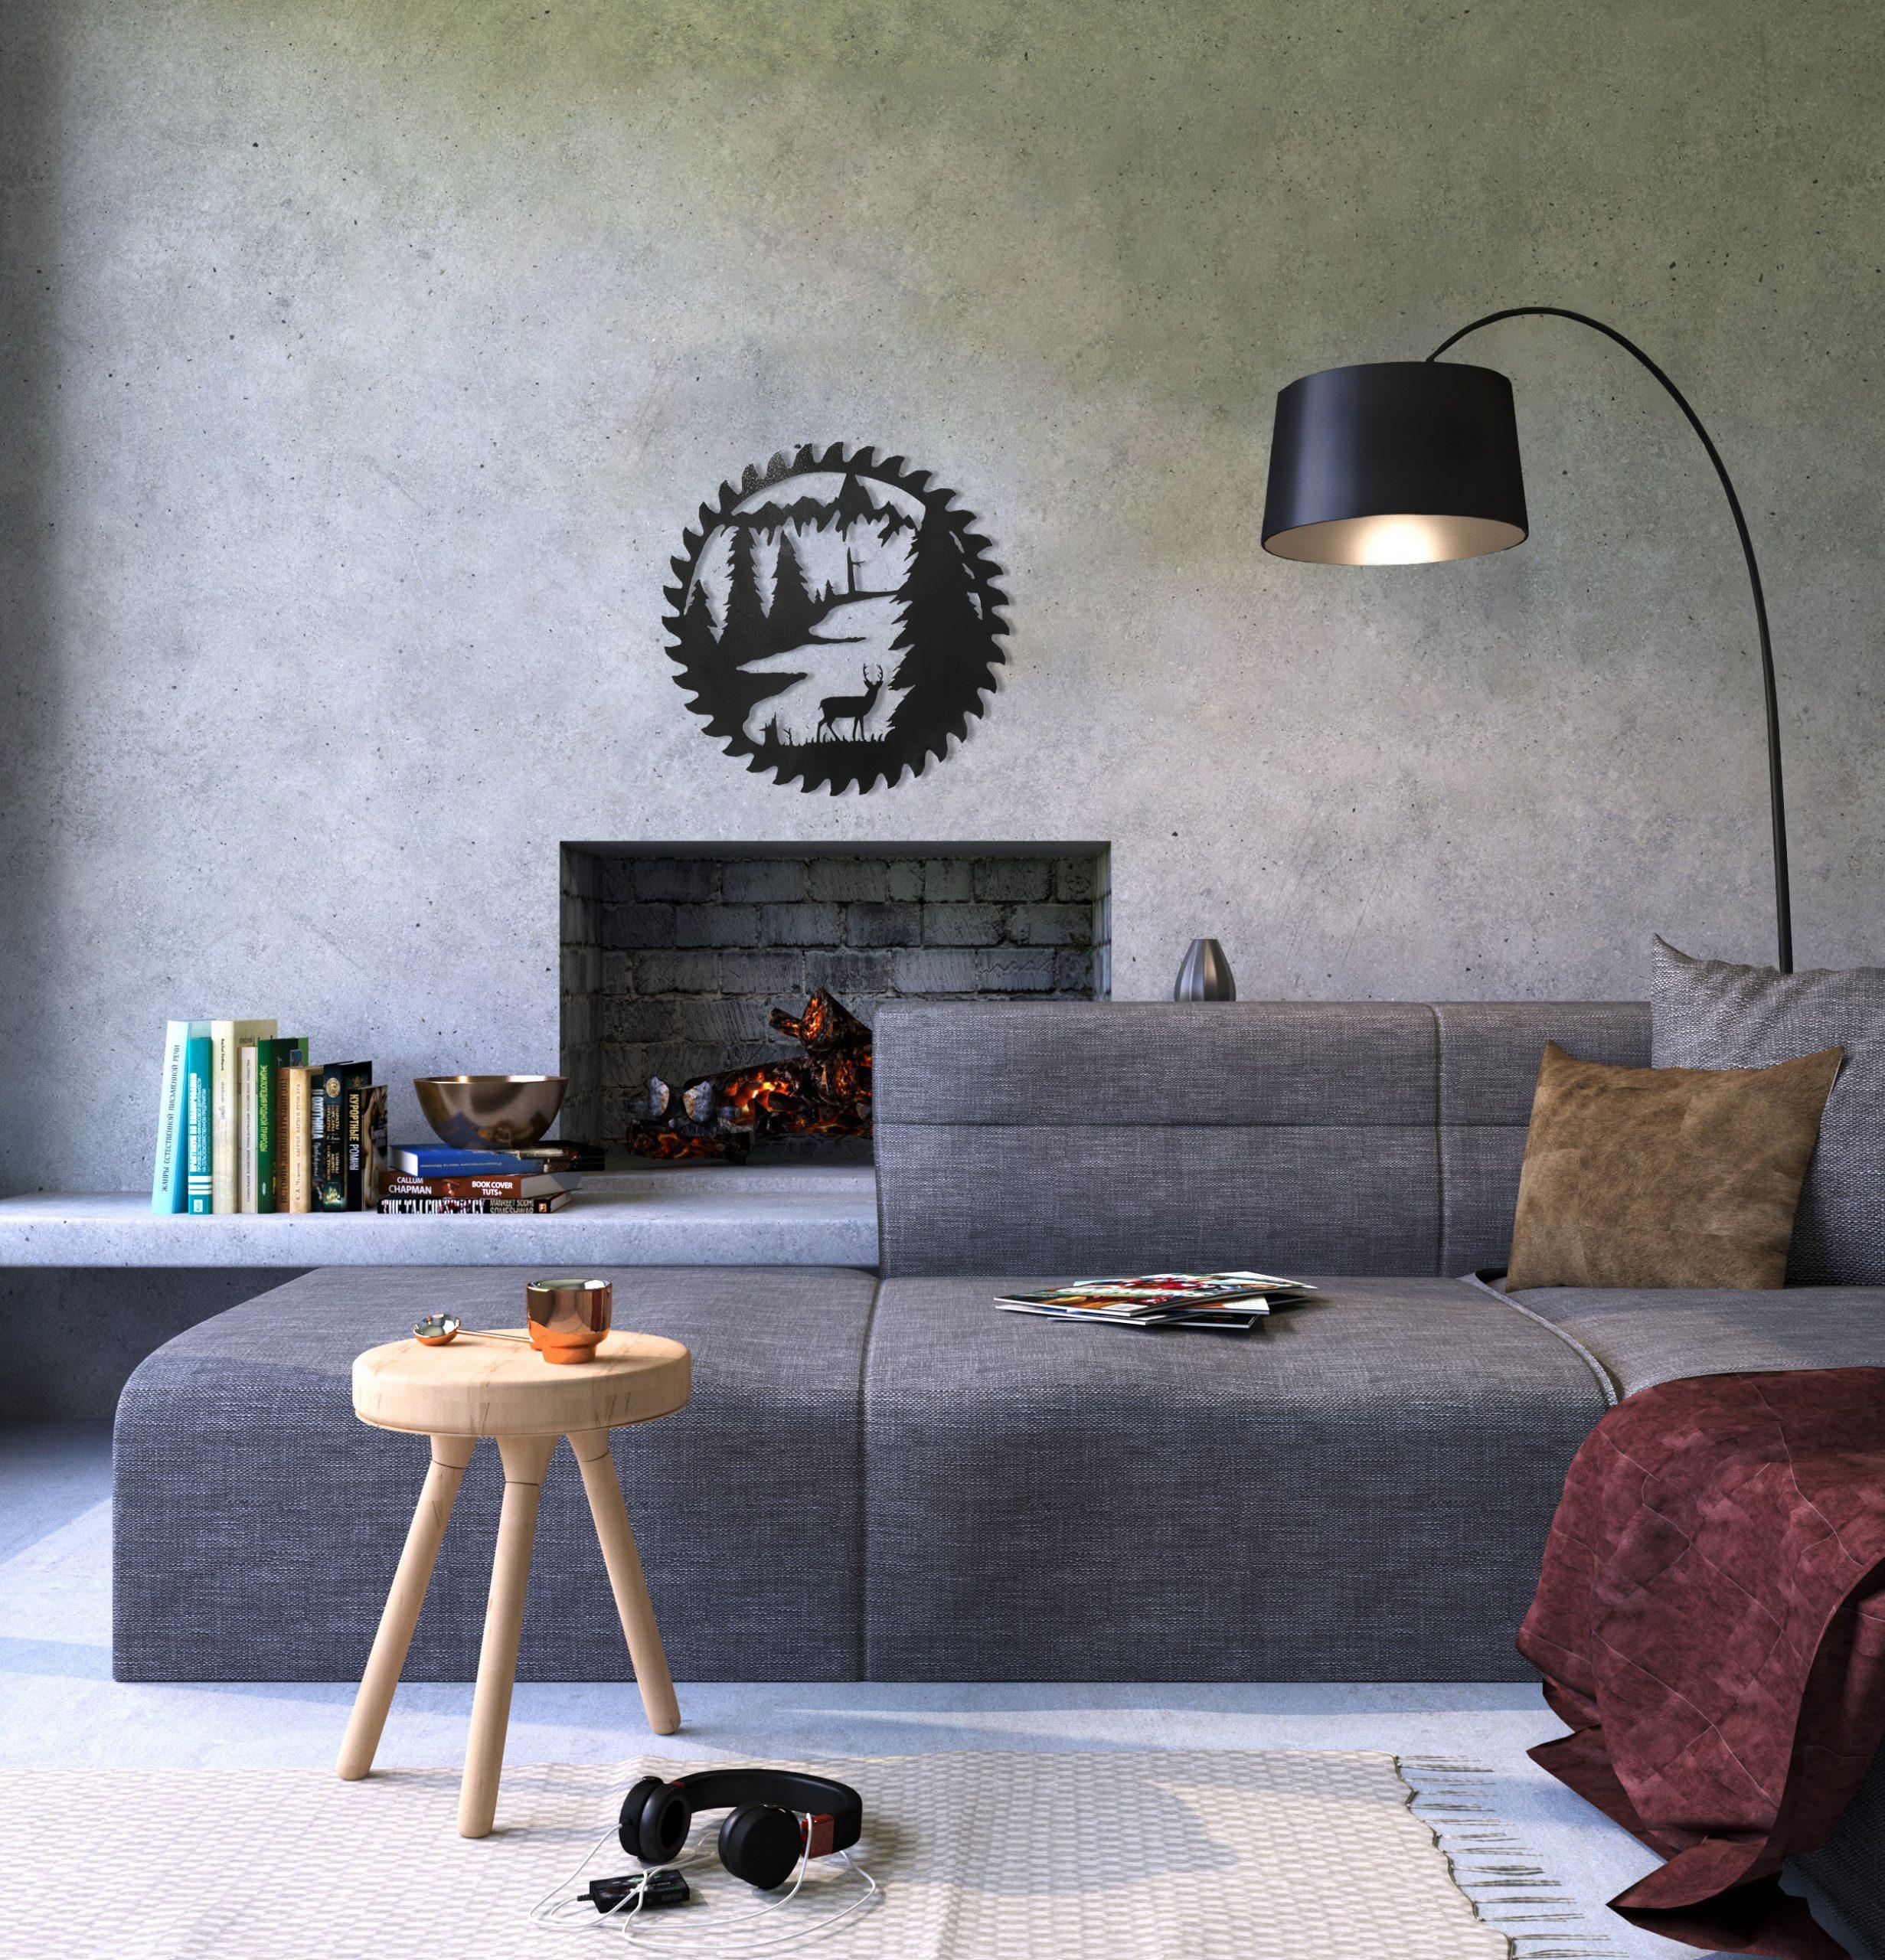 buzz-blade-in-living-room-standing-deer-black-scaled